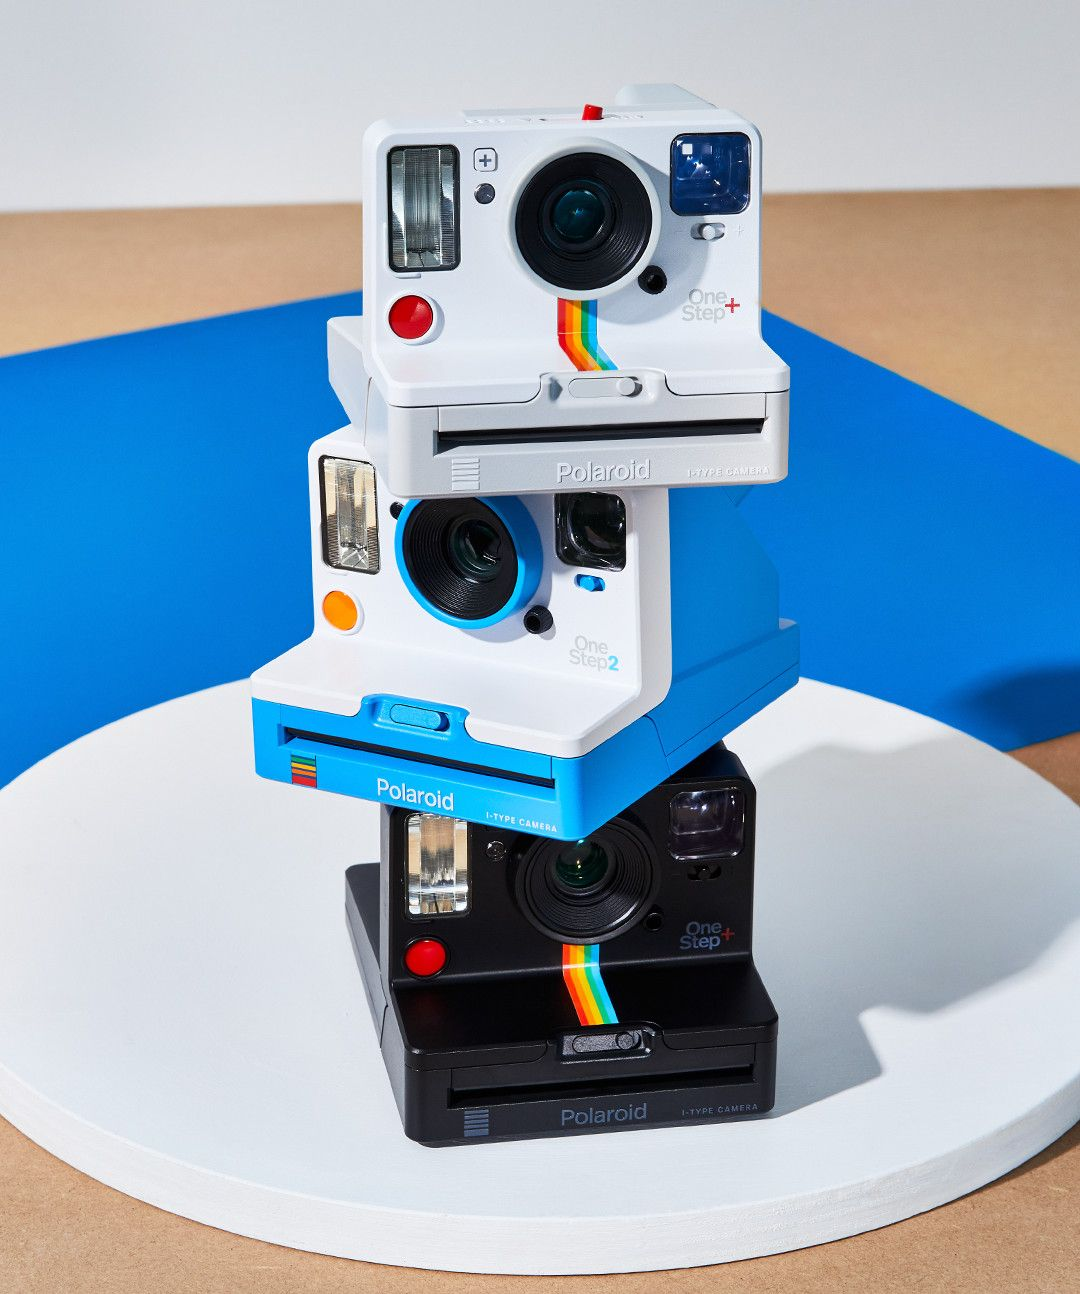 Polaroid's OneStep Plus Would Impress Even Photography Pros